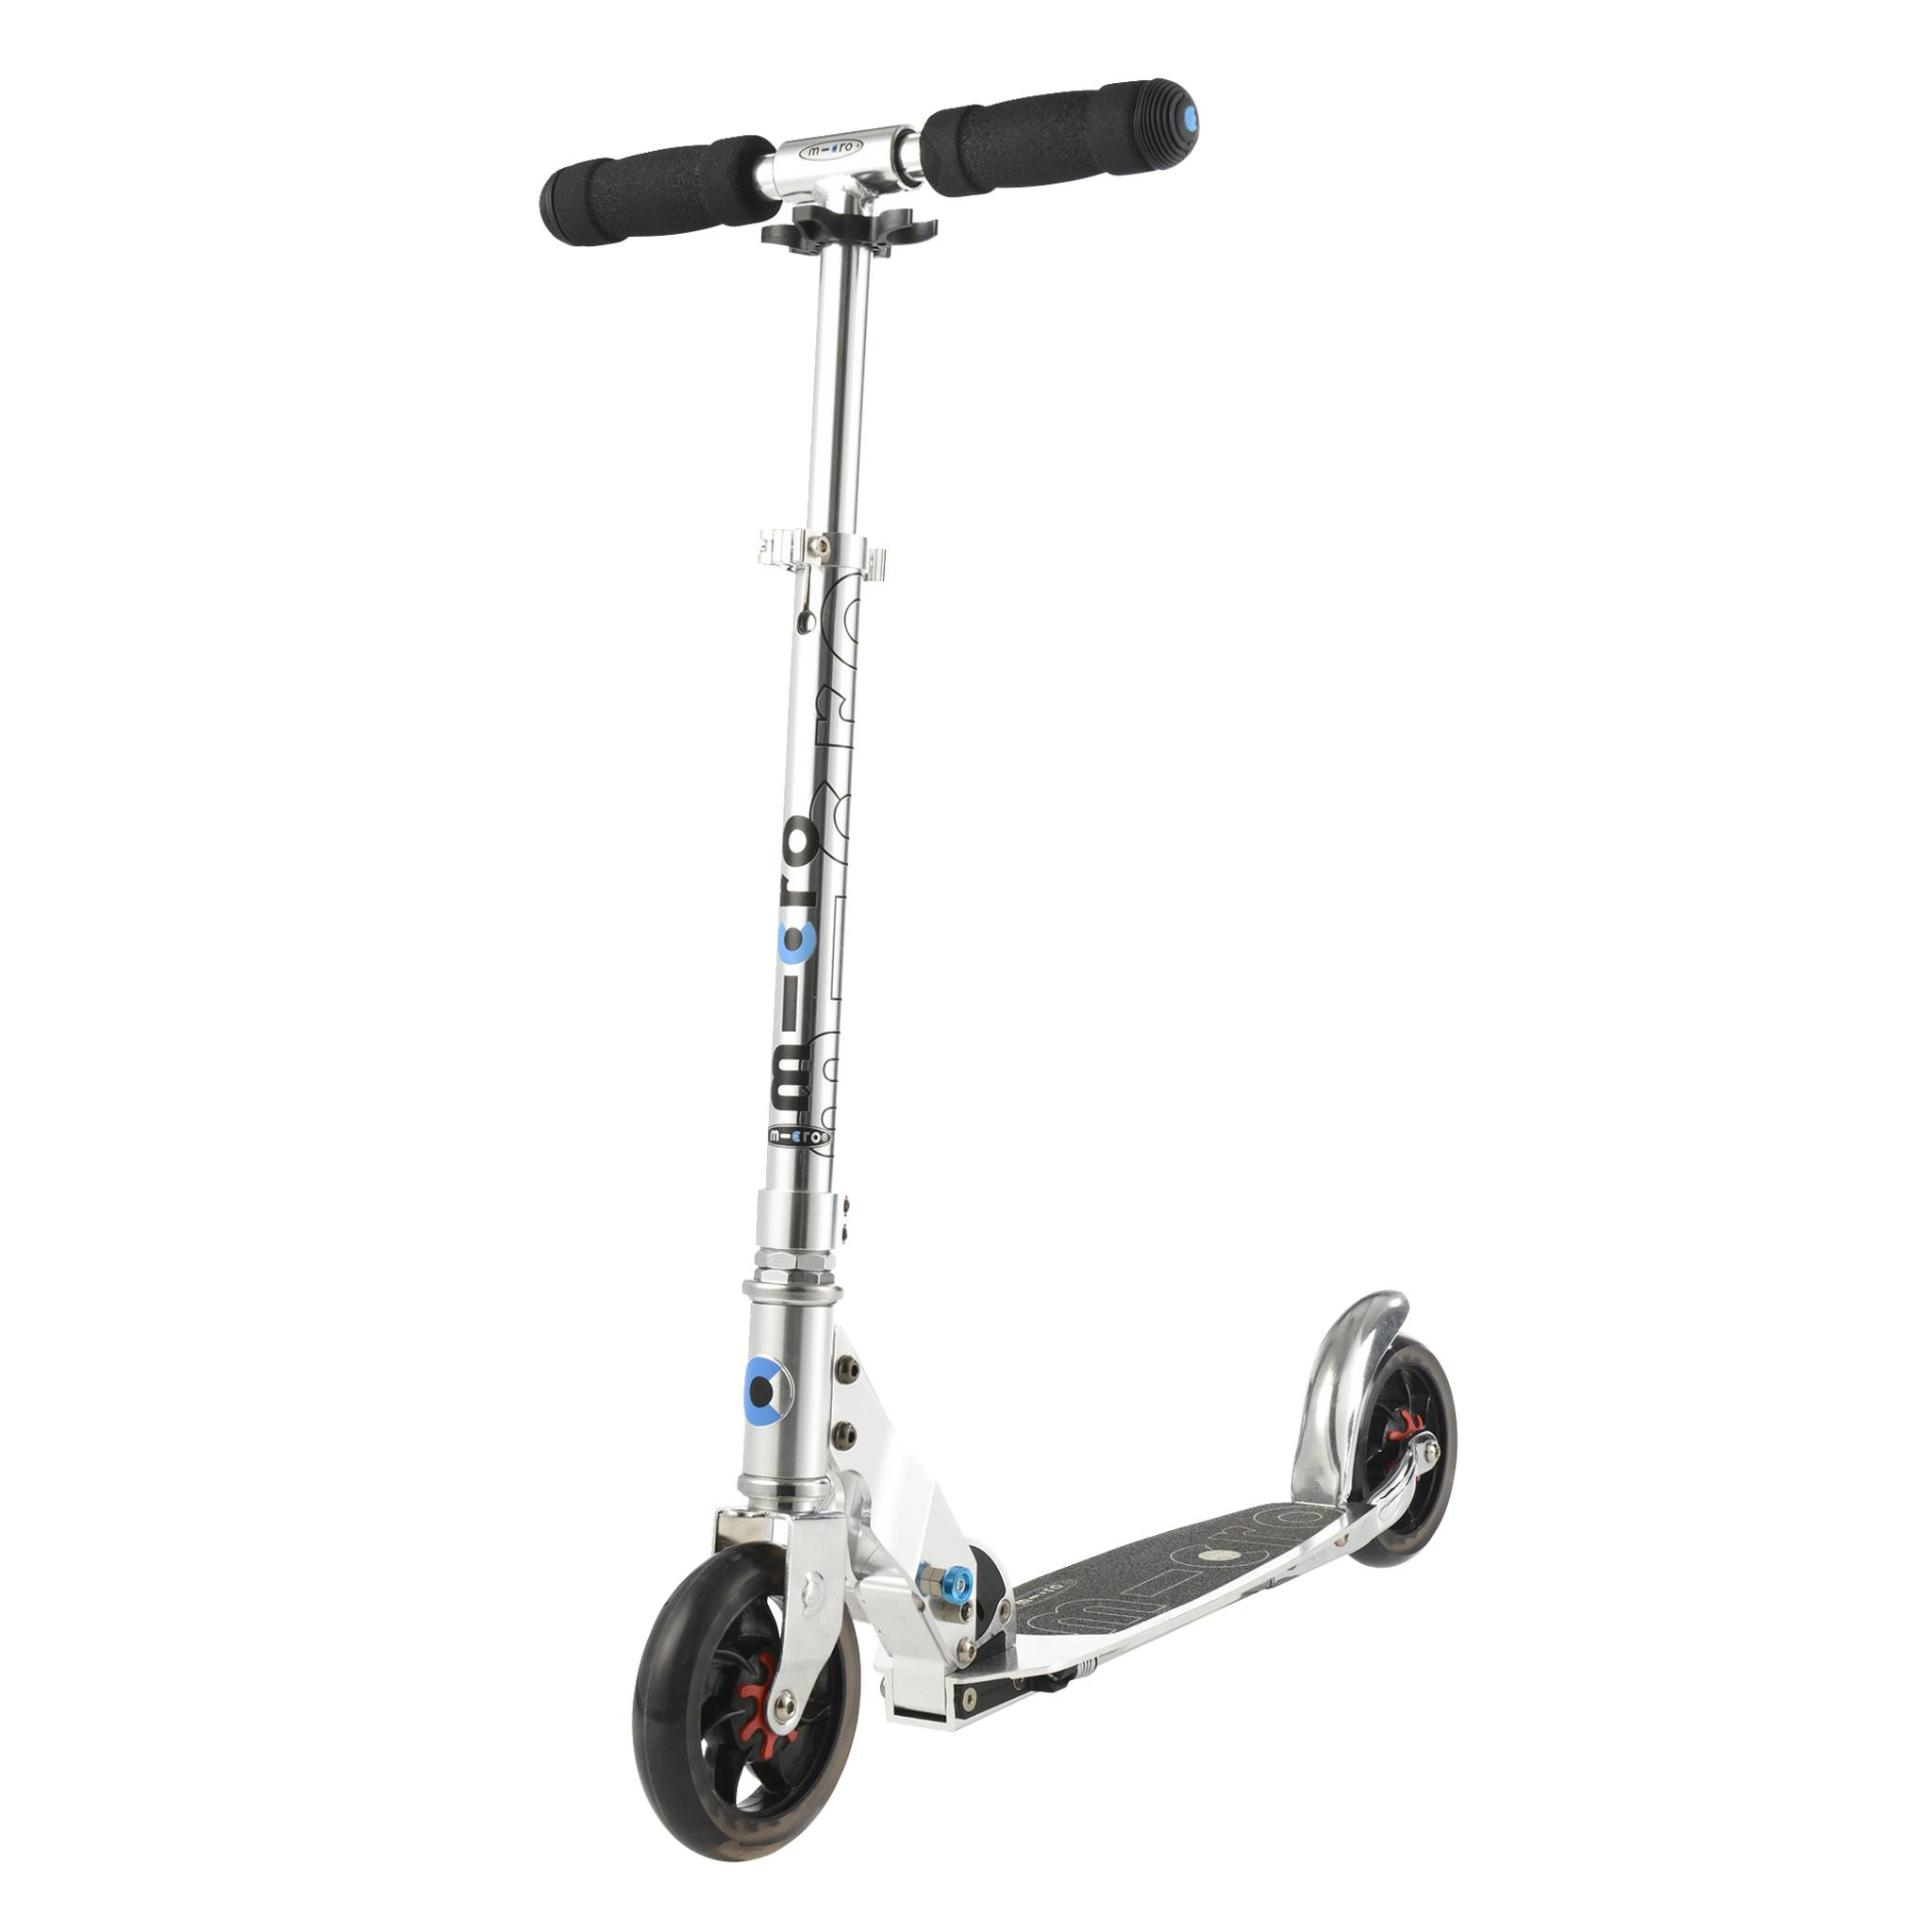 MicroSpeed+ puresilver mobilityscooter, sparkesykkel, ungdom/voksne